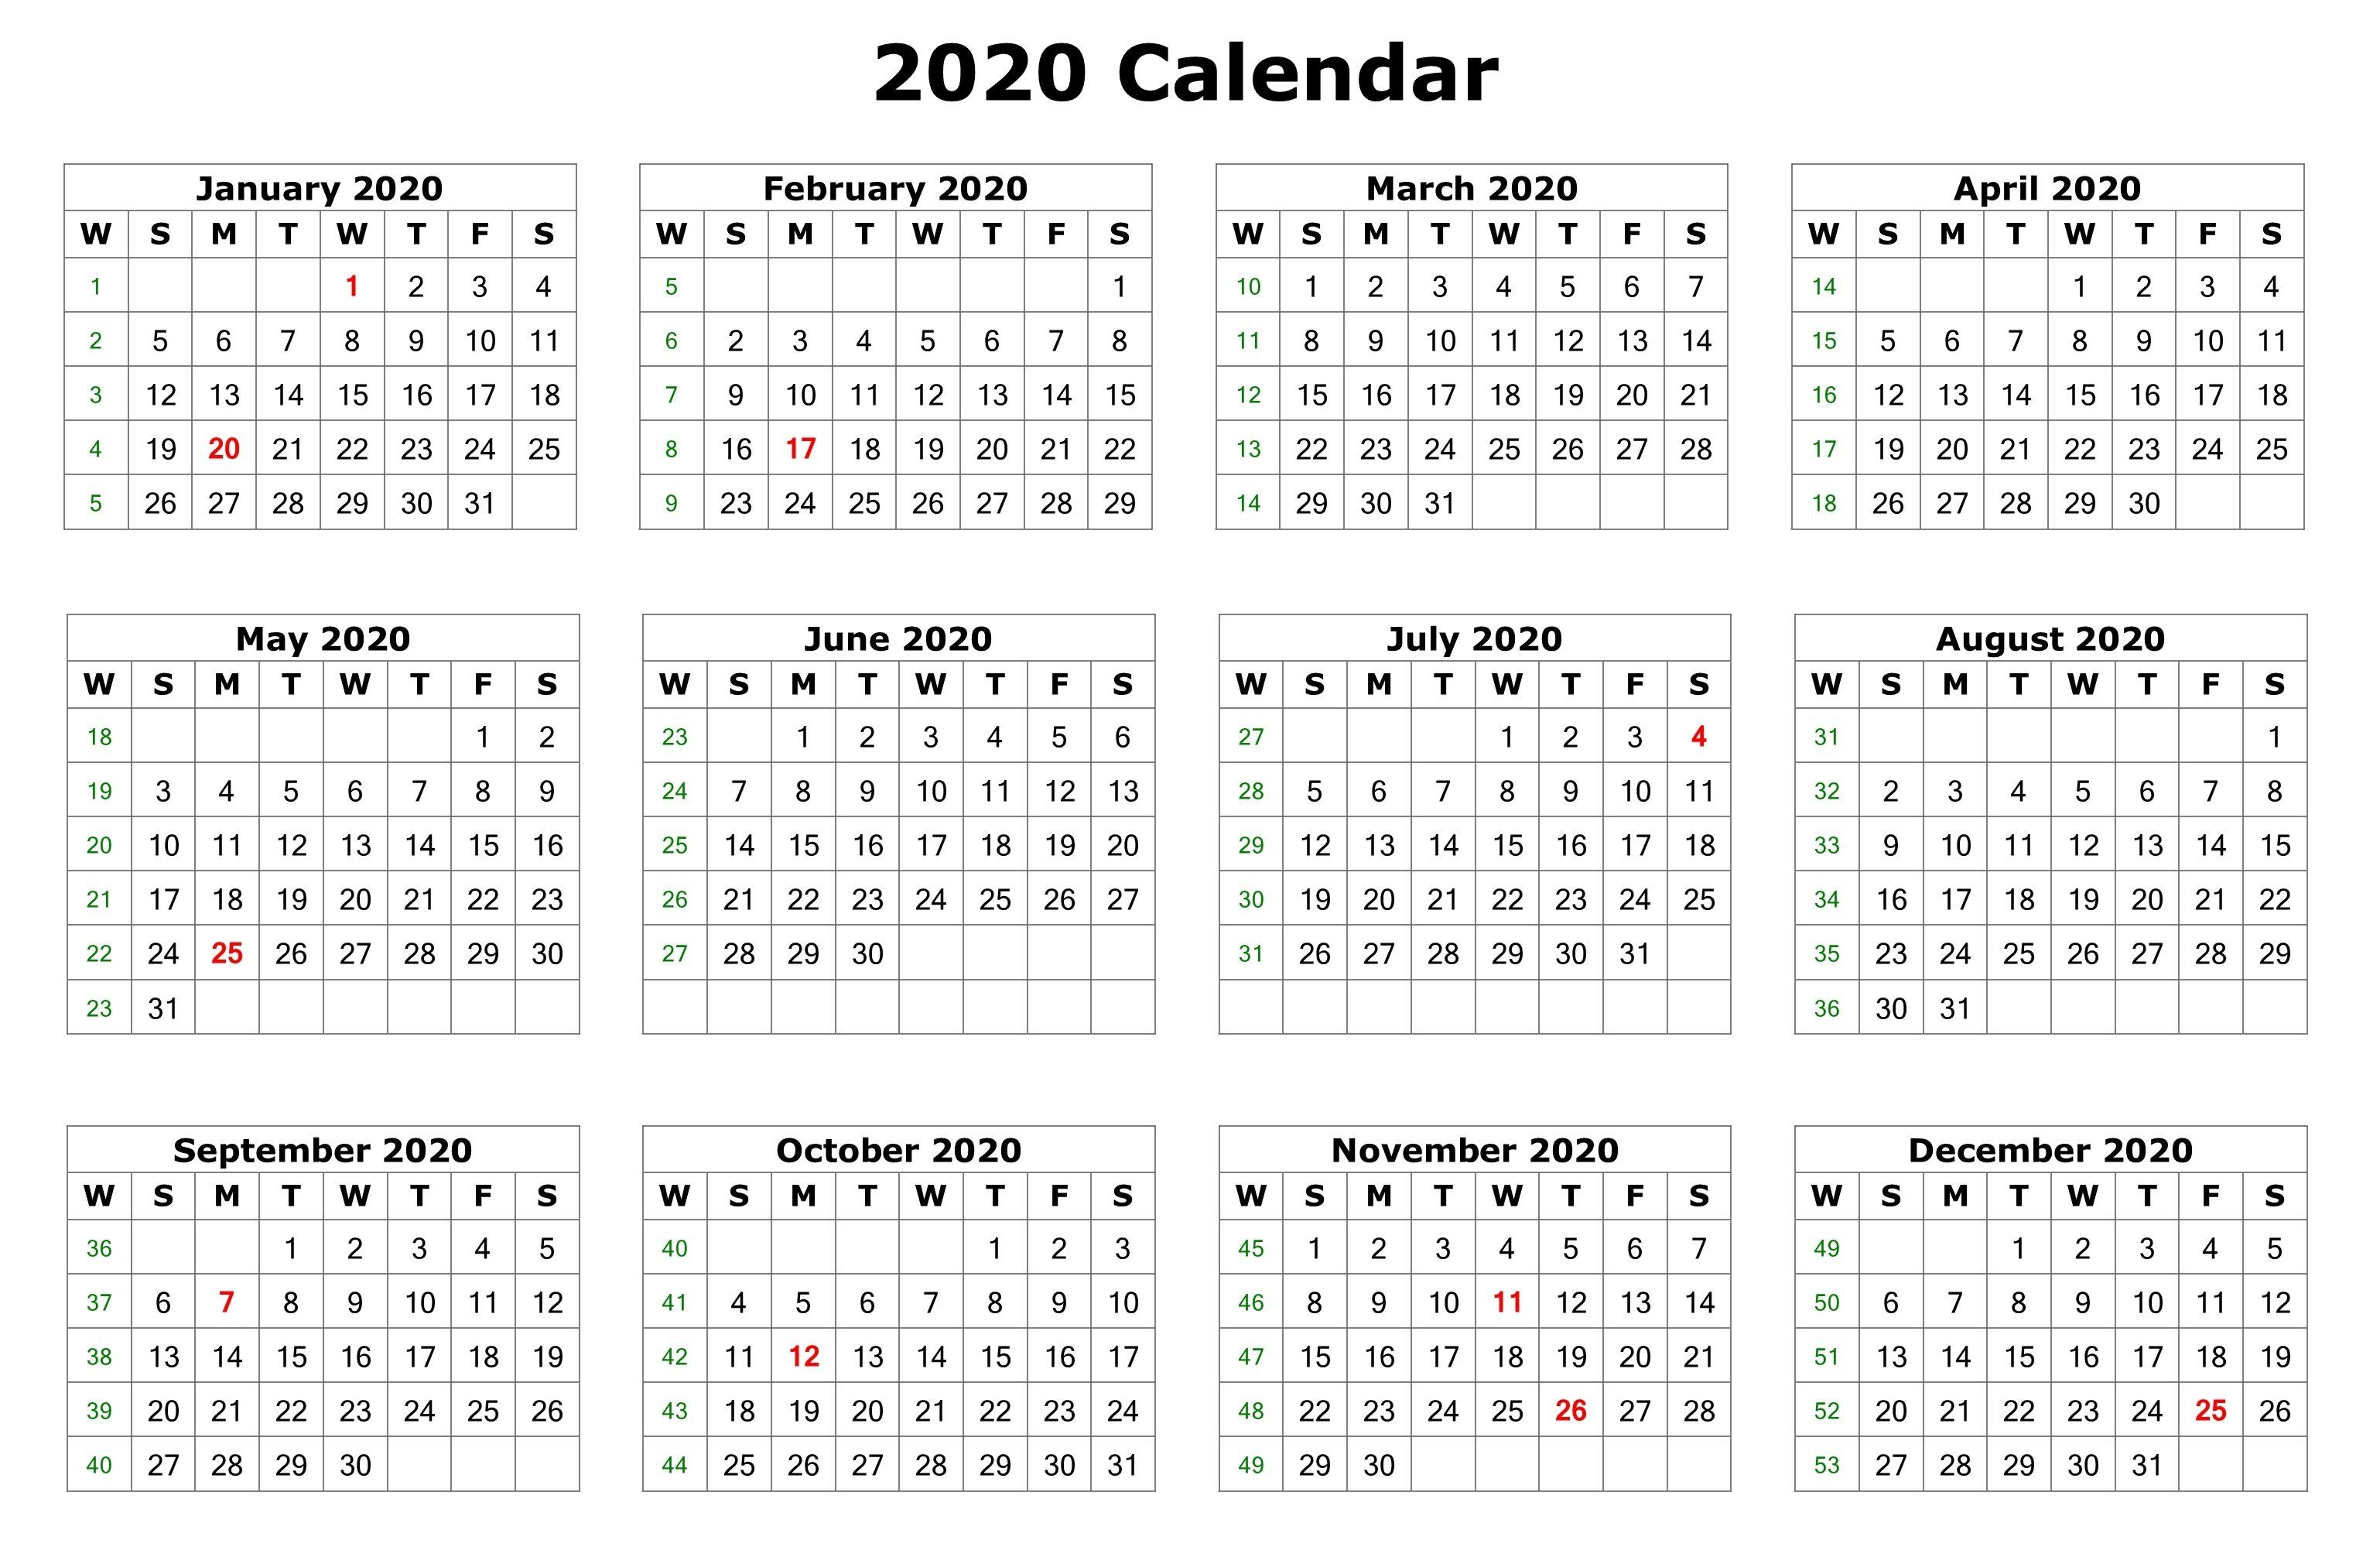 2020 12 Months Calendar Printable   2020 Calendars